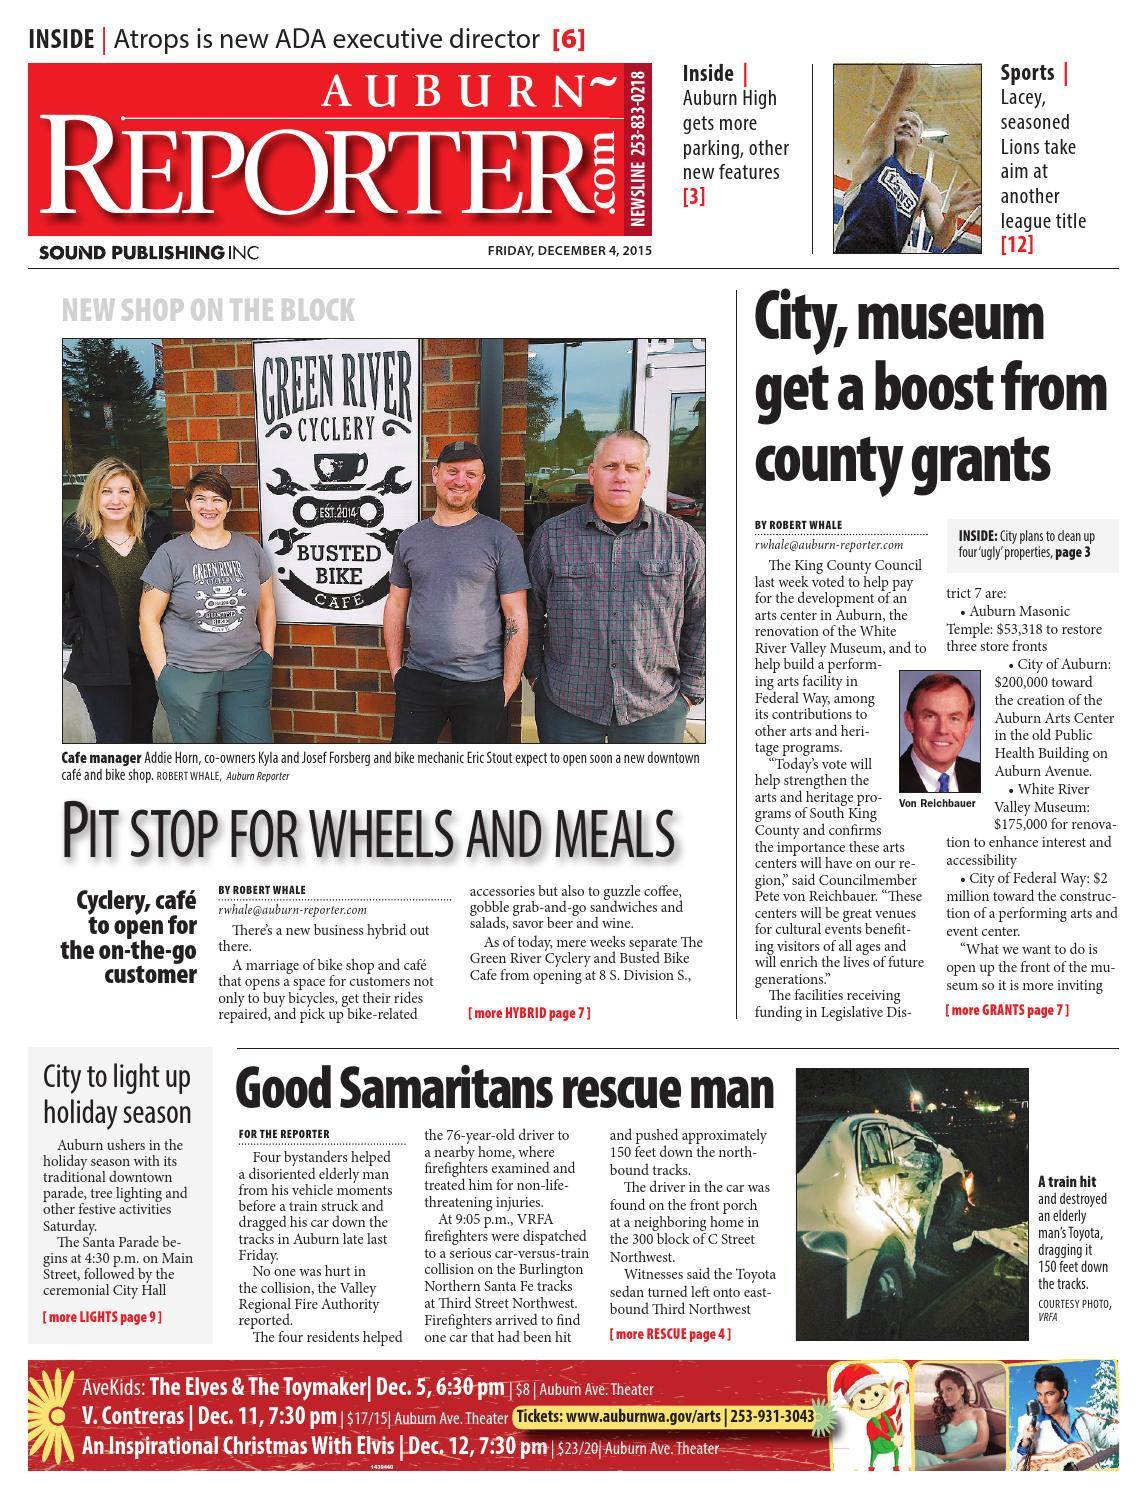 Auburn Reporter, December 04, 2015 by Sound Publishing - issuu